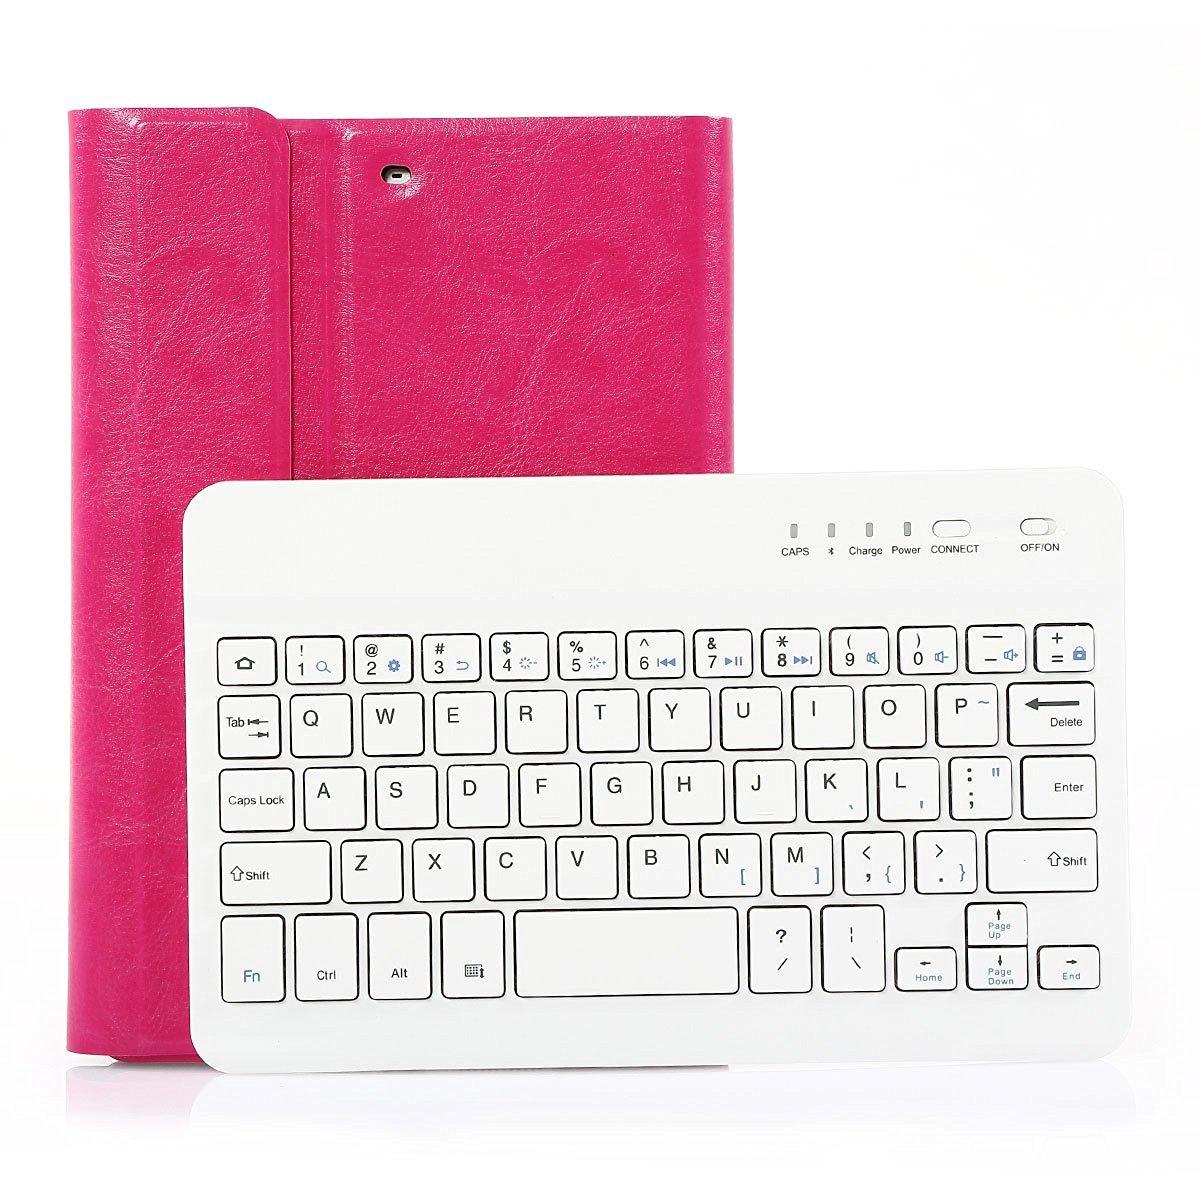 SymbolLife iPad mini 1/2/3 Keyboard Case - Ultra Slim Shell Lightweight Cover with Magnetically Detachable Wireless Bluetooth Keyboard for iPad mini 3 / iPad mini 2 / iPad mini 1, Rose